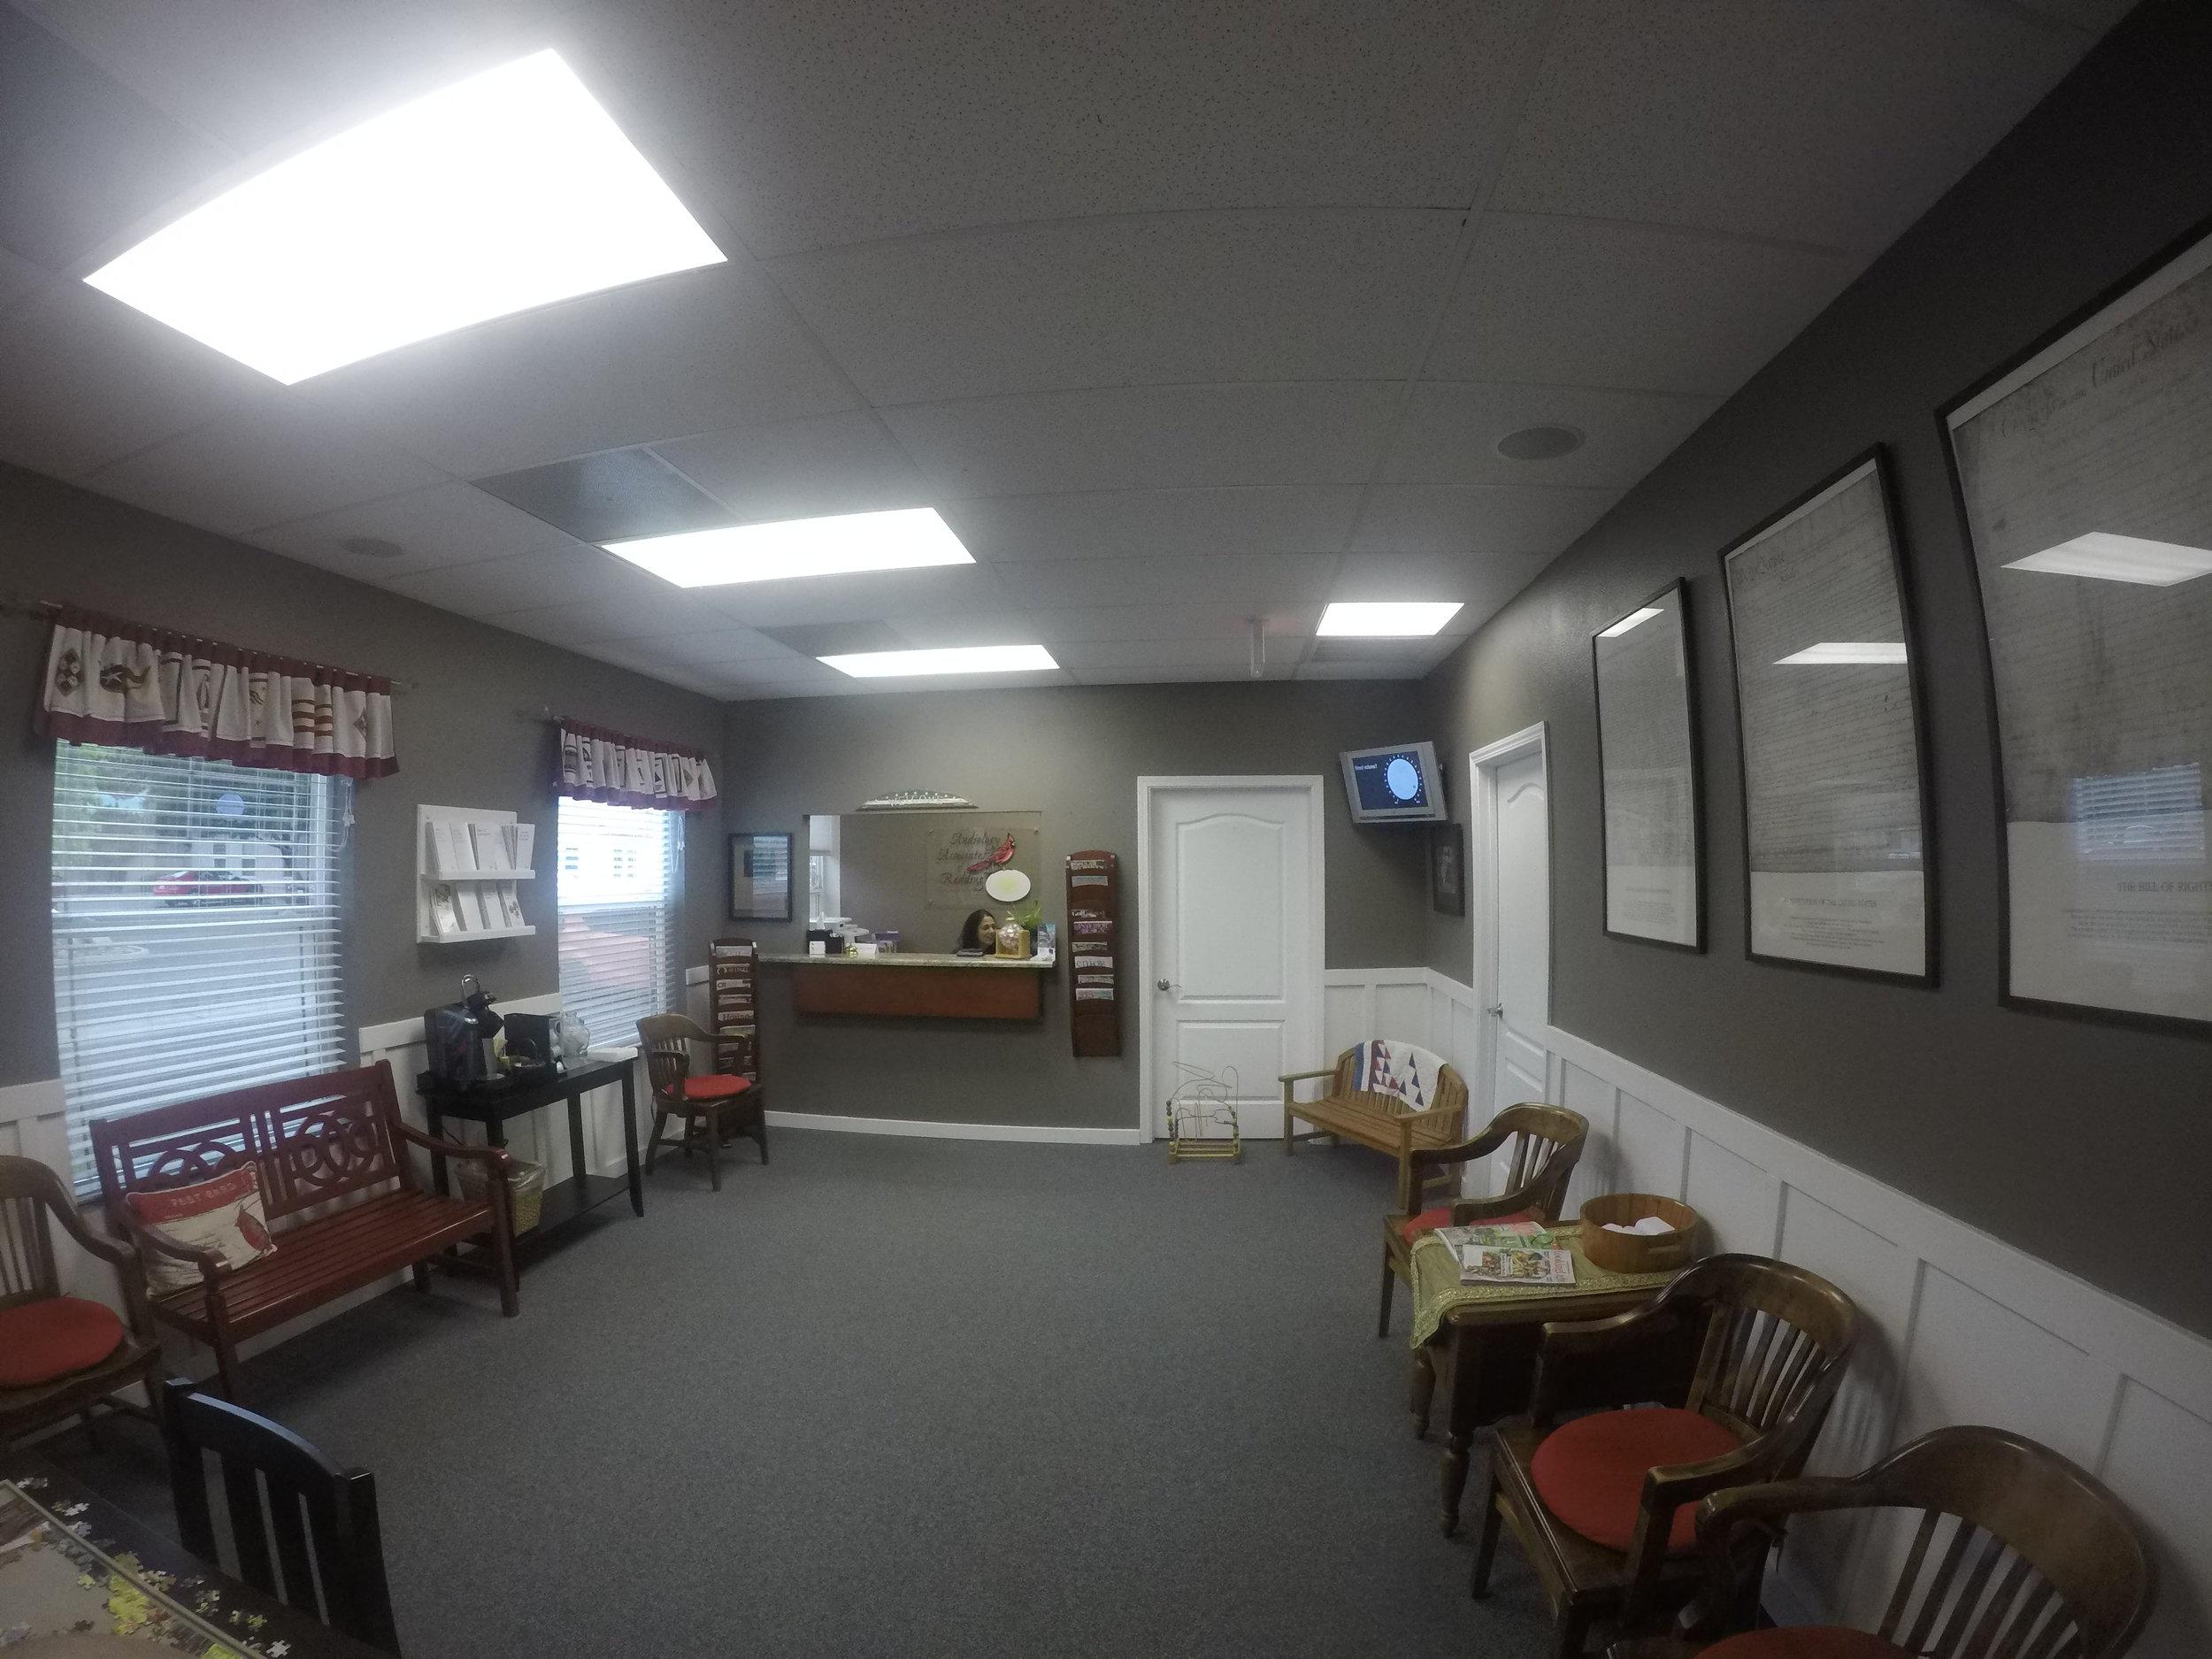 Audiology Associates of Redding waiting room